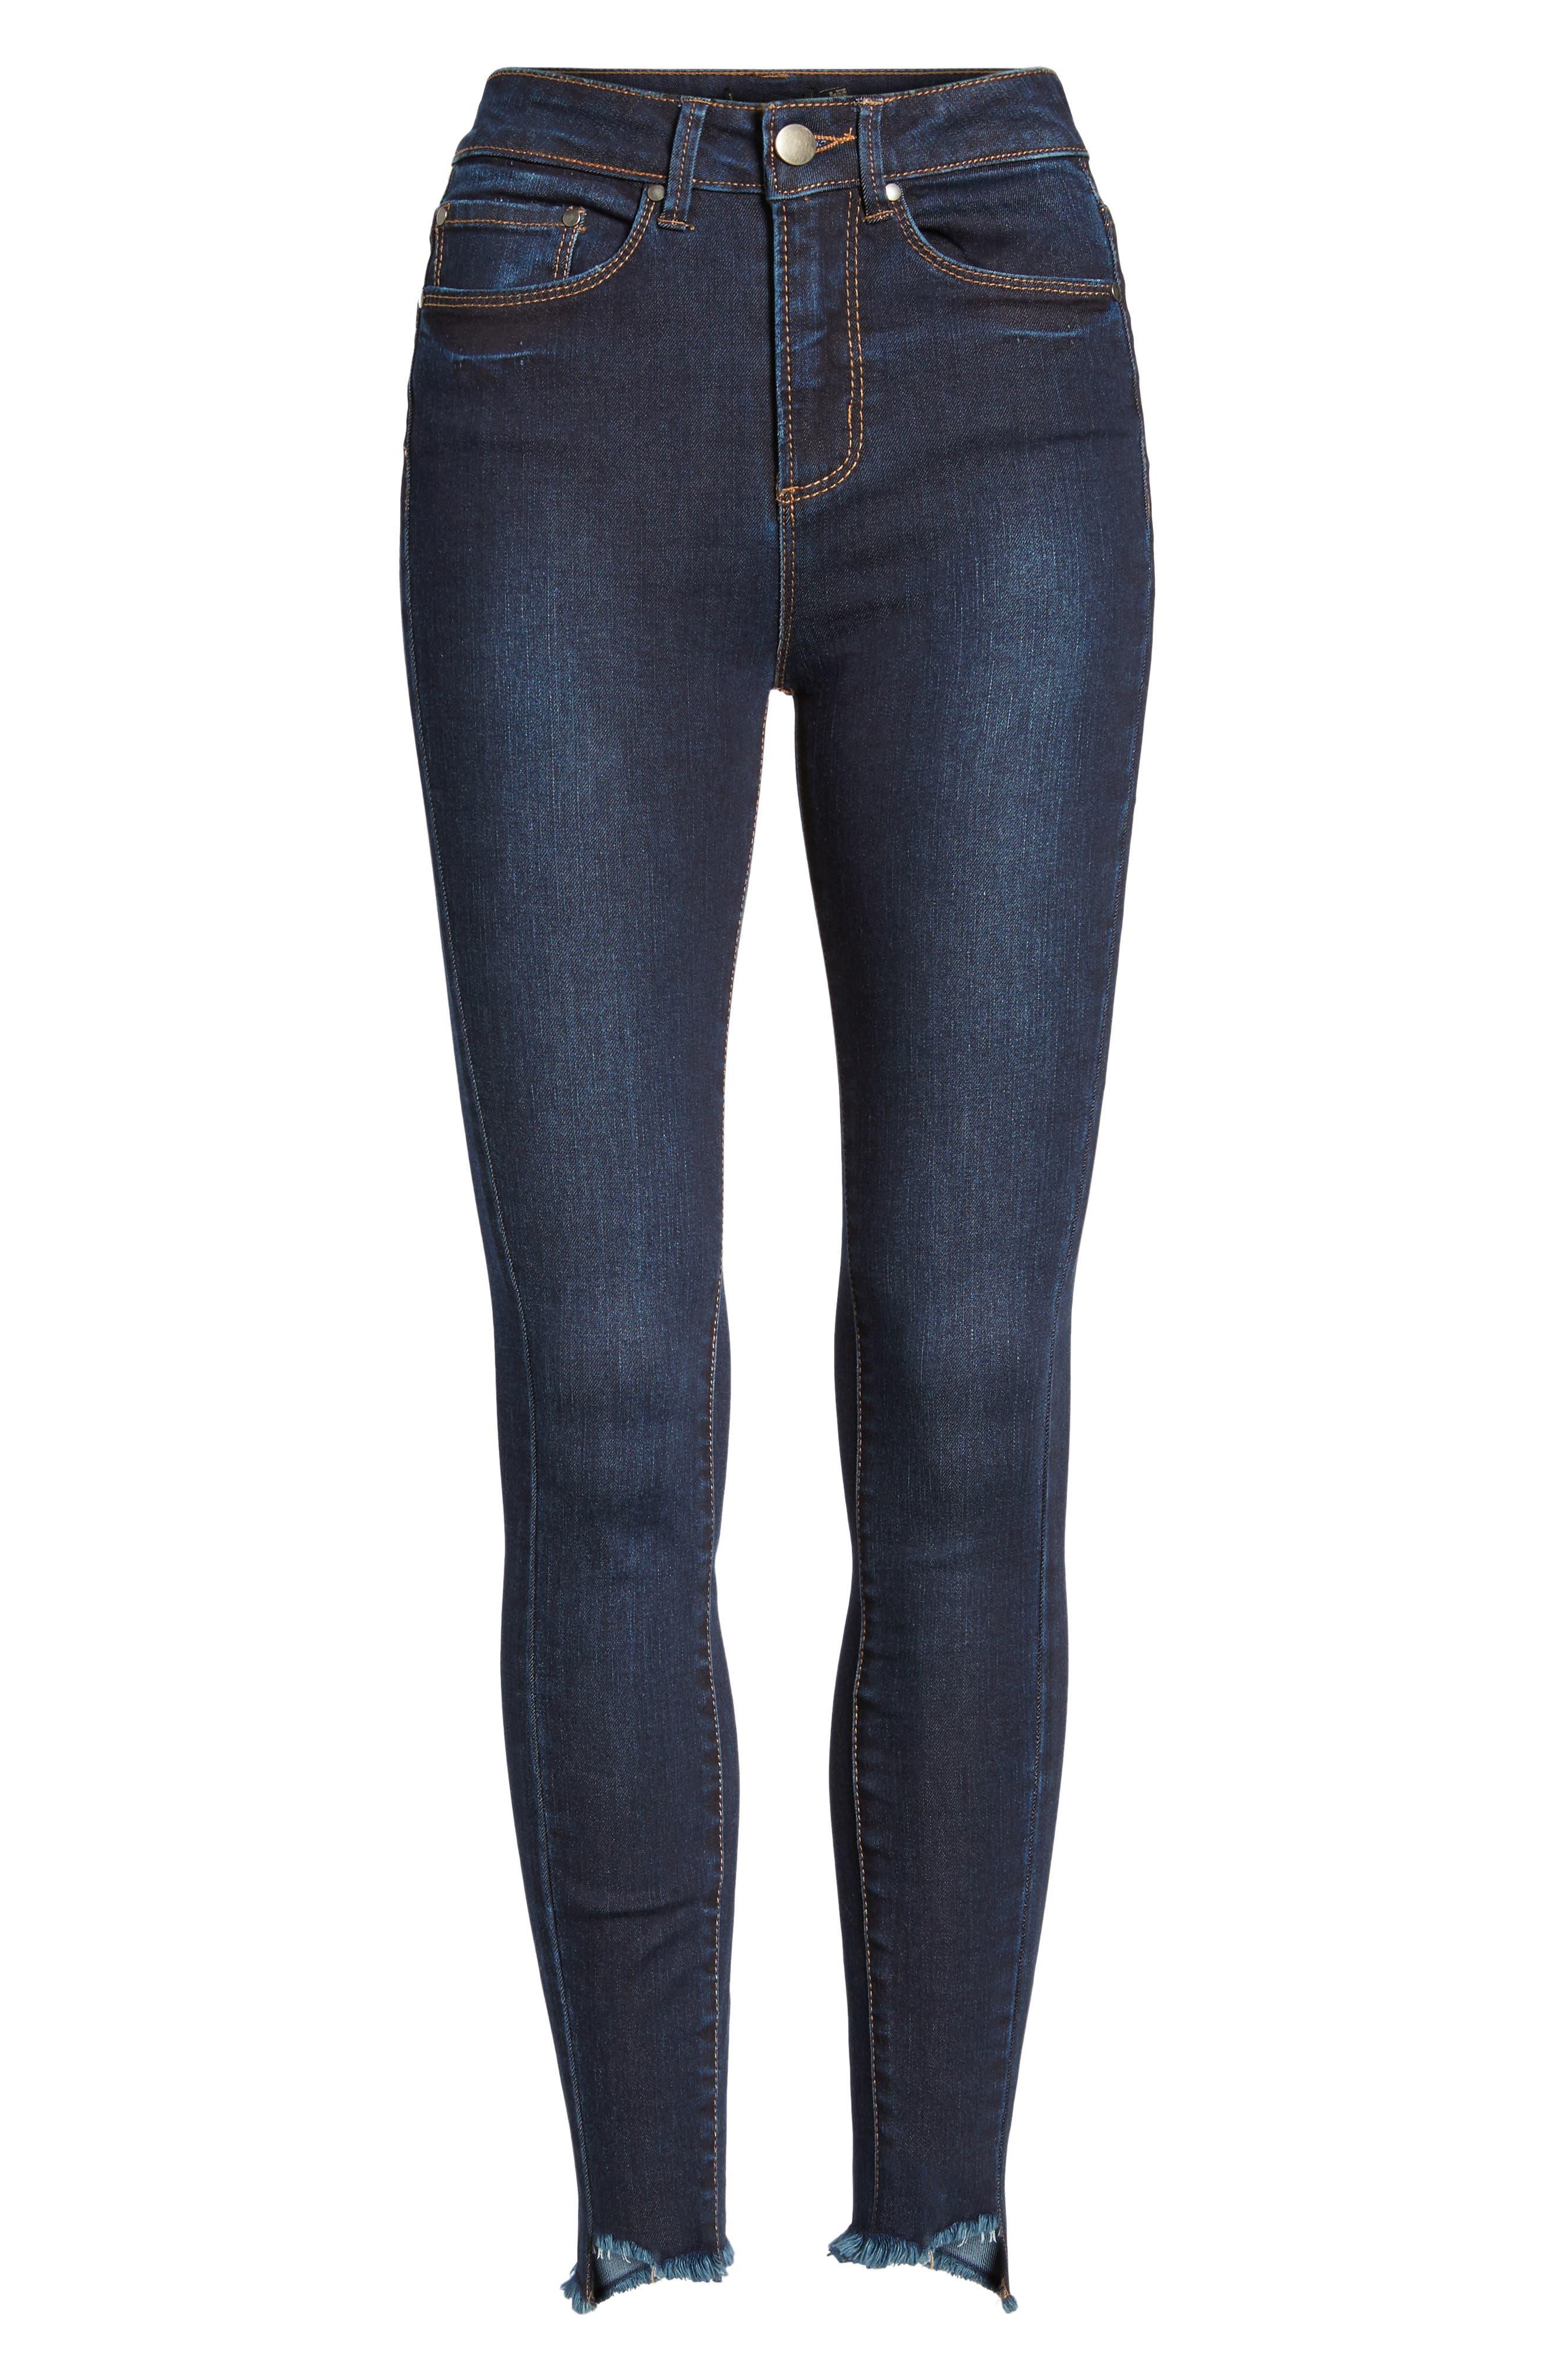 Clark High Waist Skinny Jeans,                             Alternate thumbnail 7, color,                             400